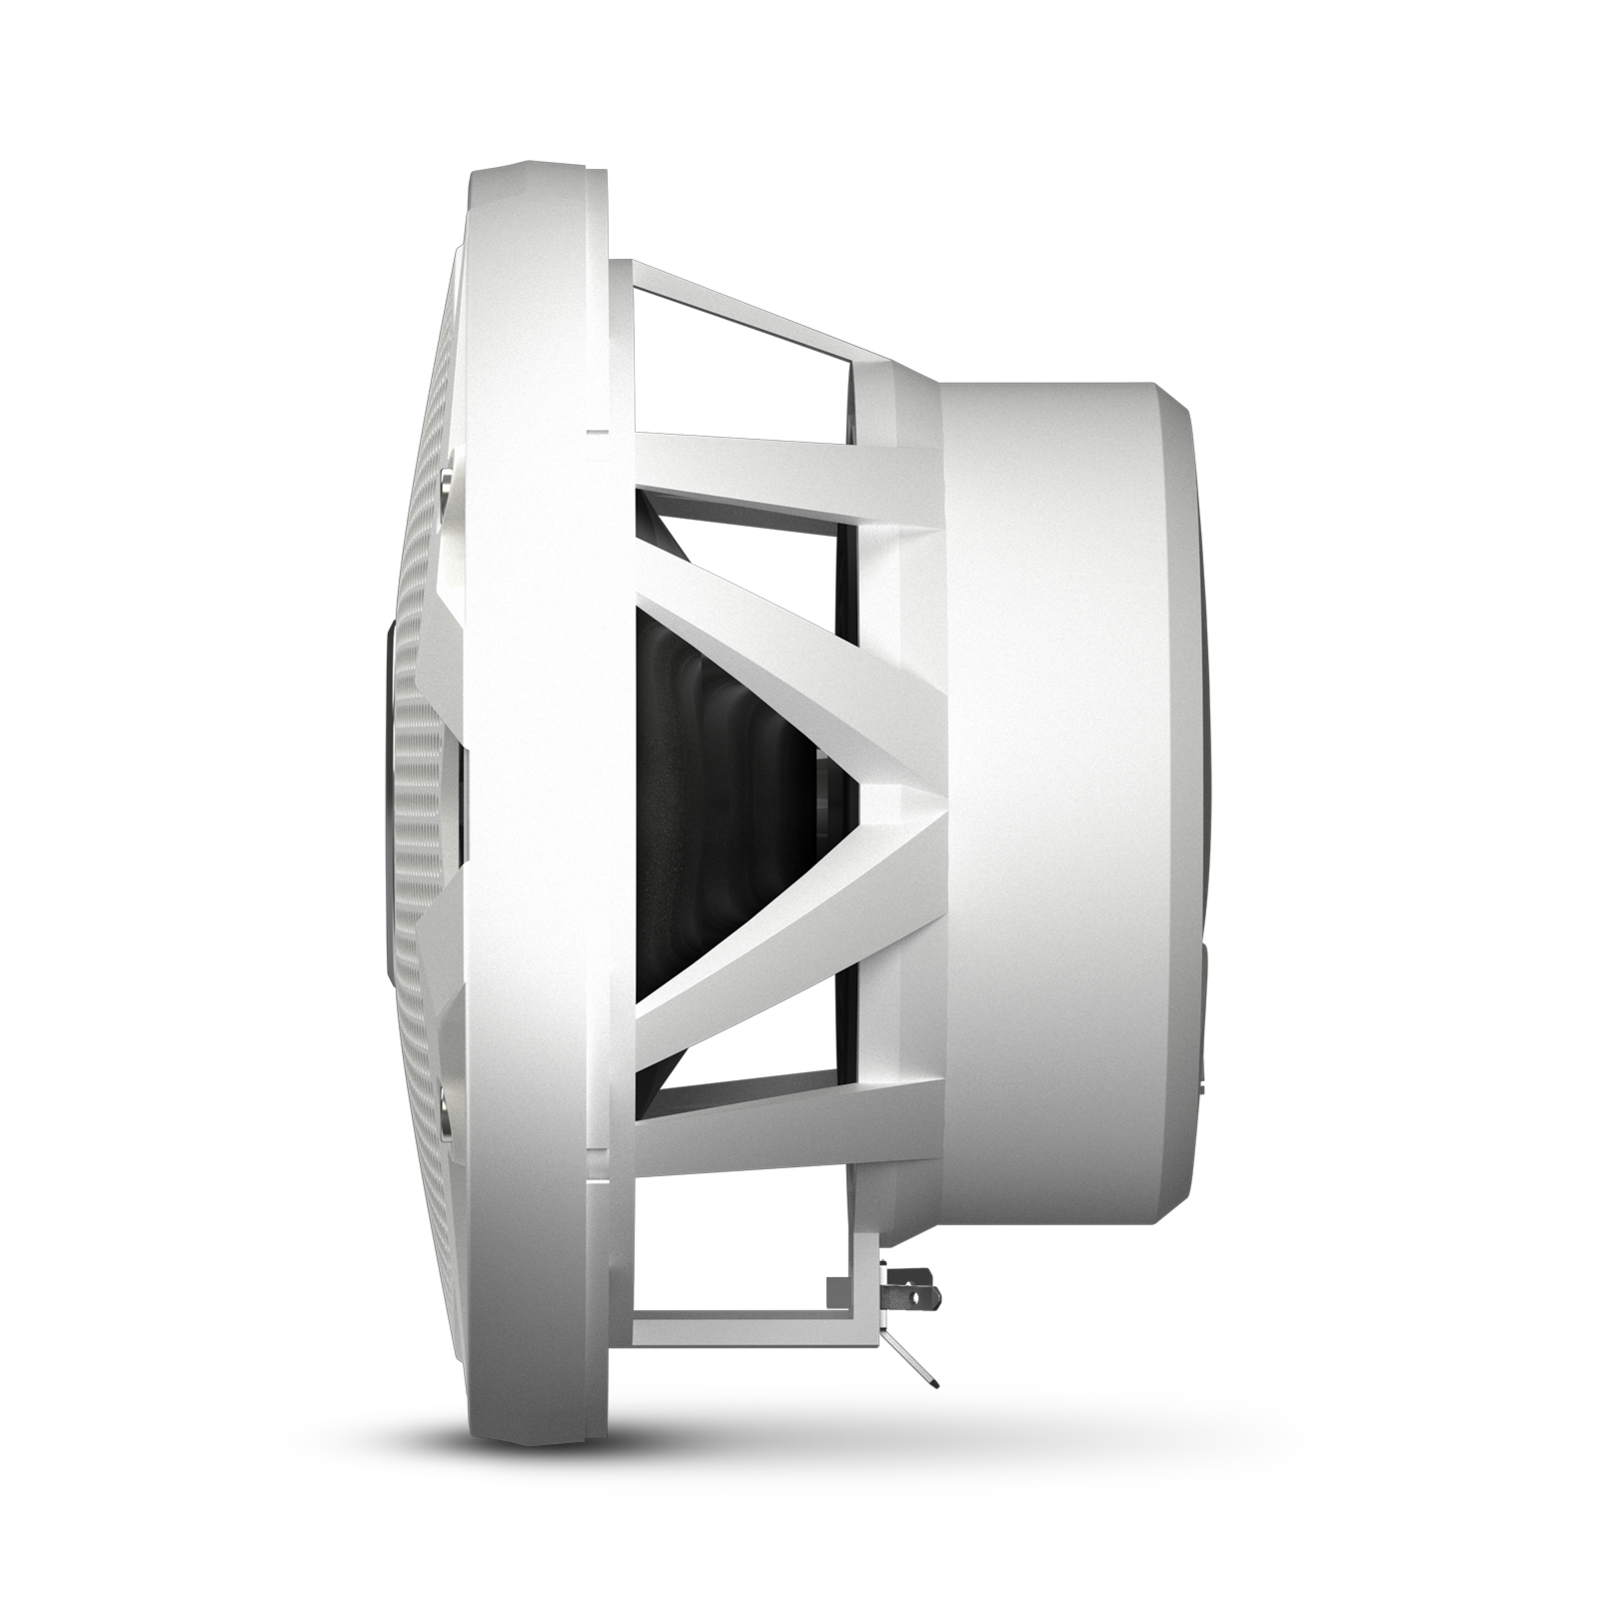 MS 9520